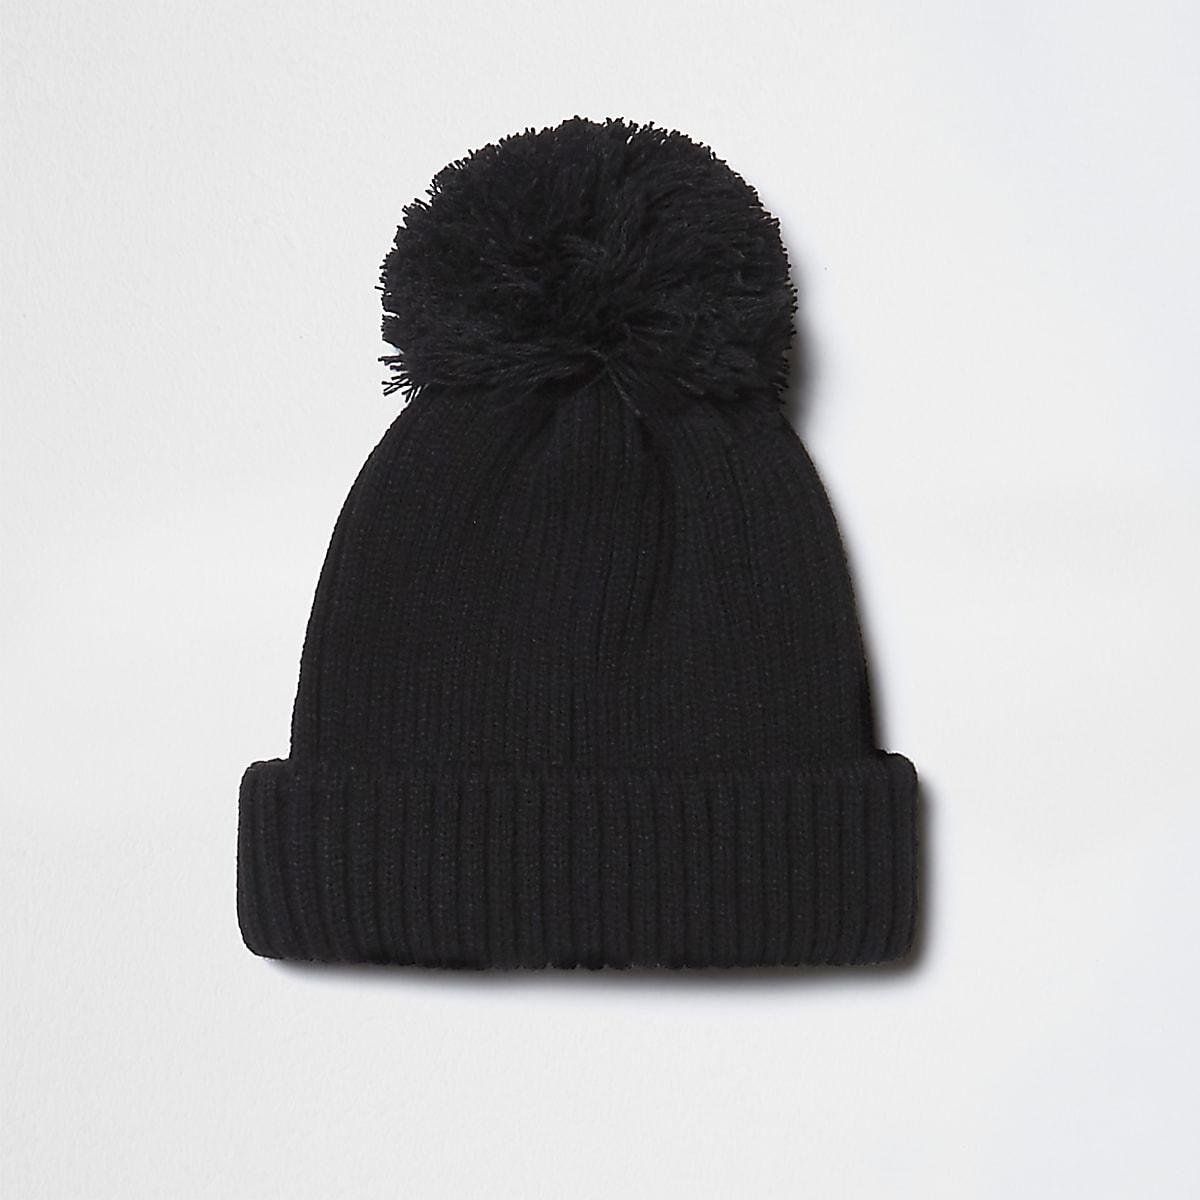 Black knit bobble hat